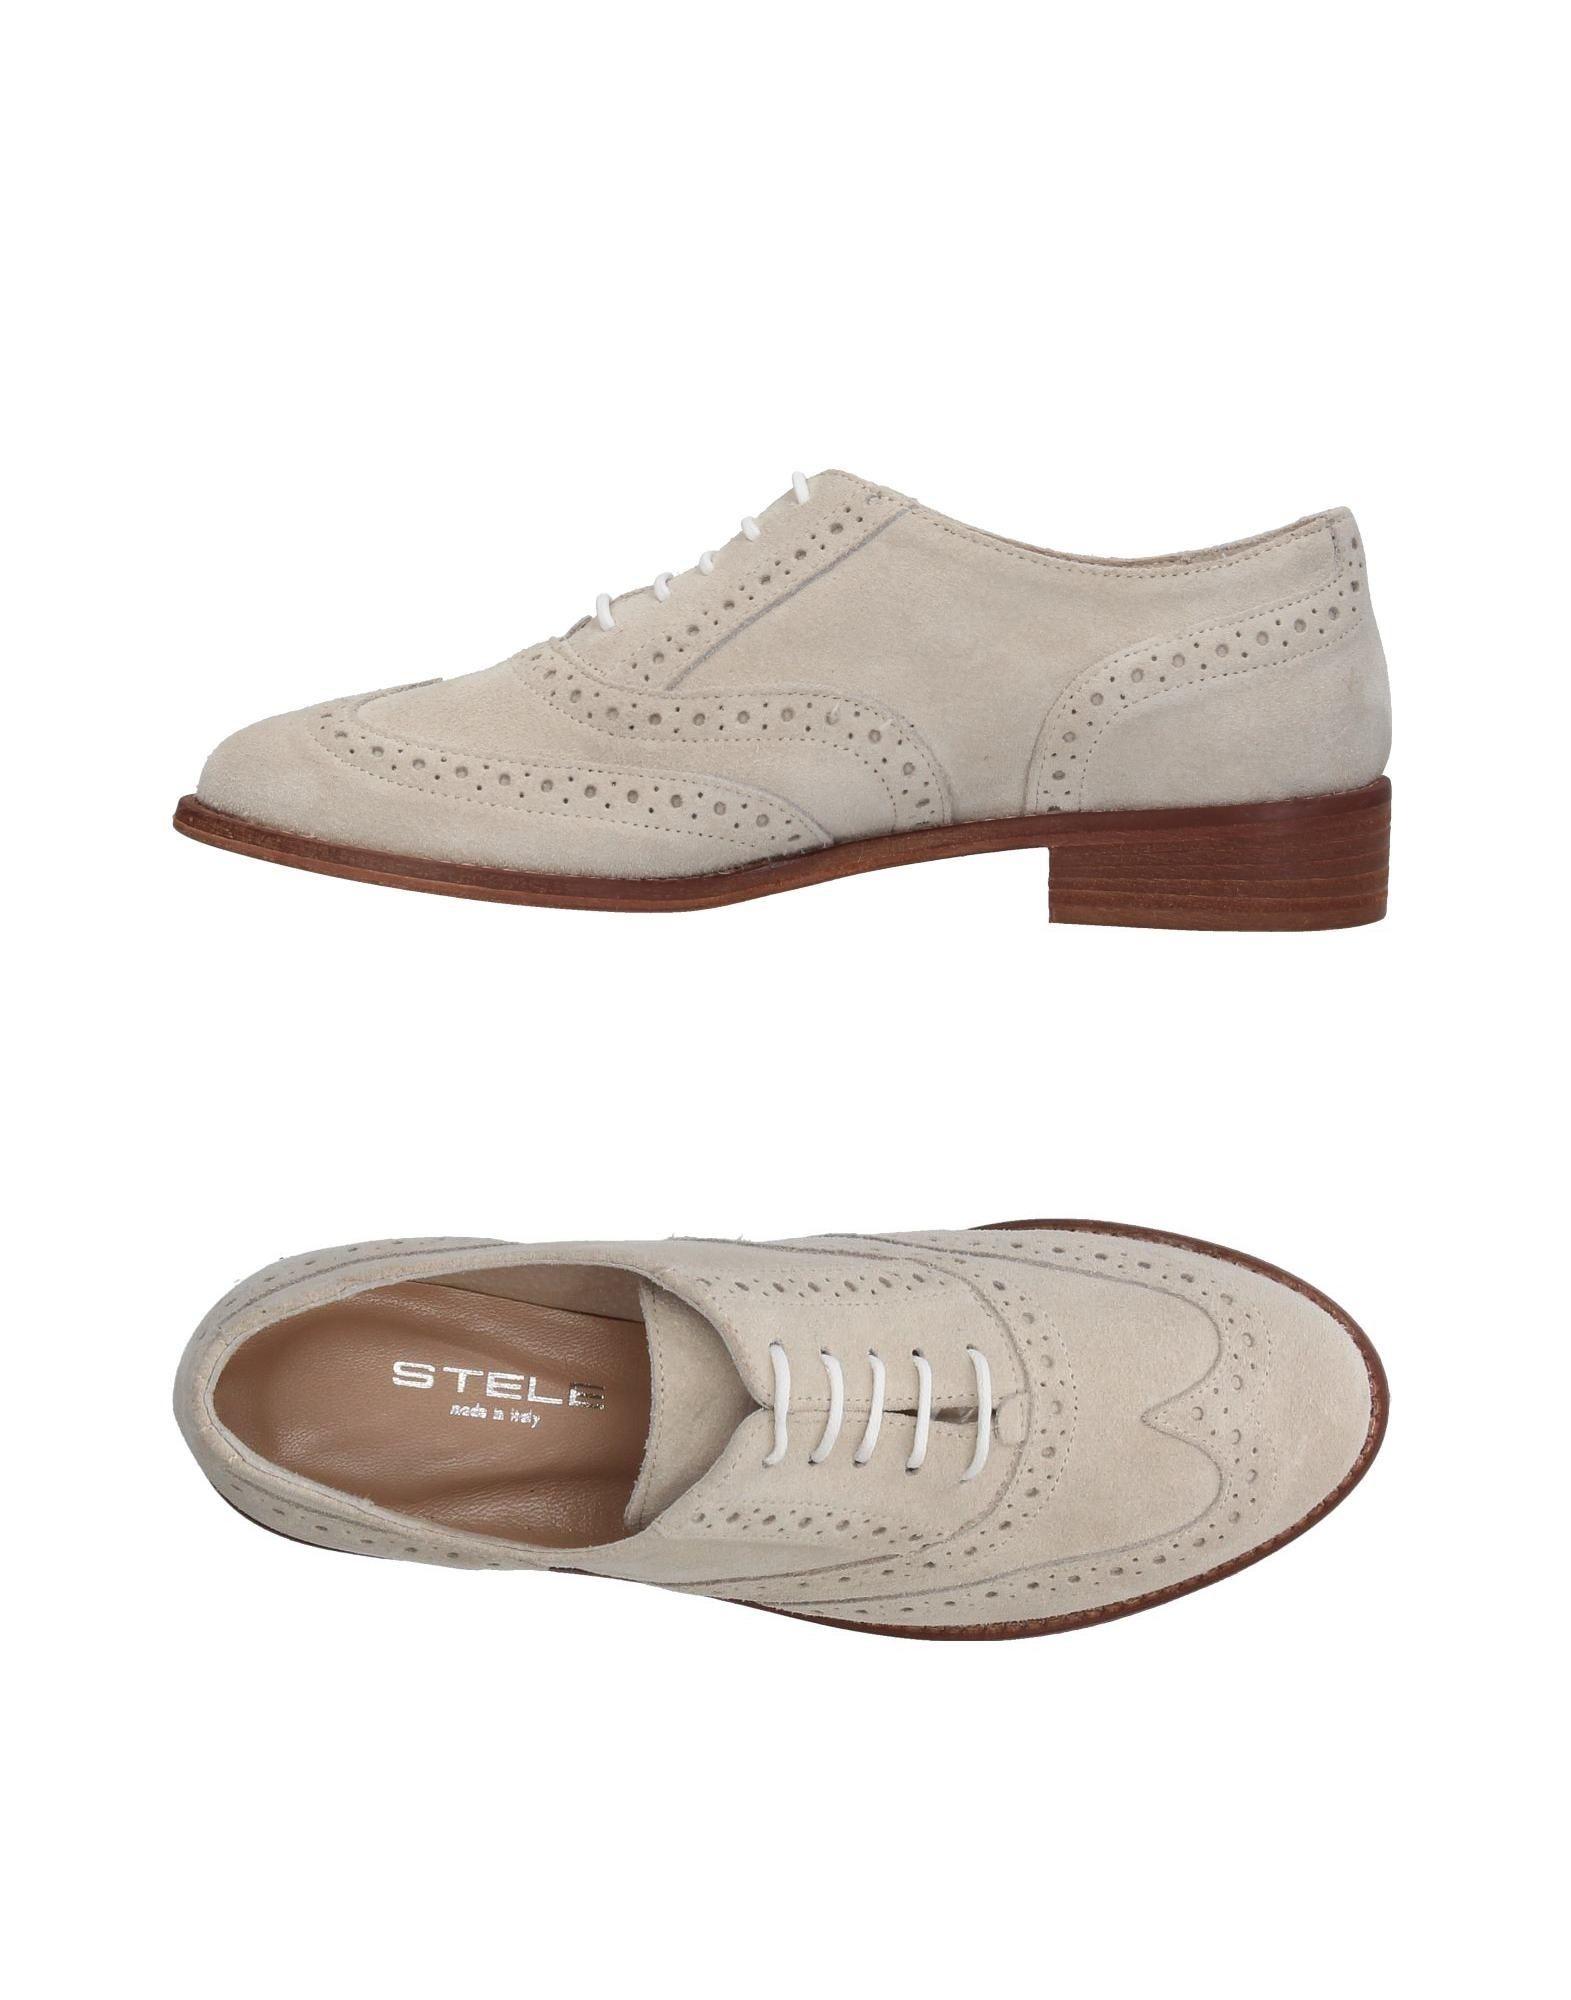 Stele Schnürschuhe Damen  11376362CH Gute Qualität beliebte Schuhe